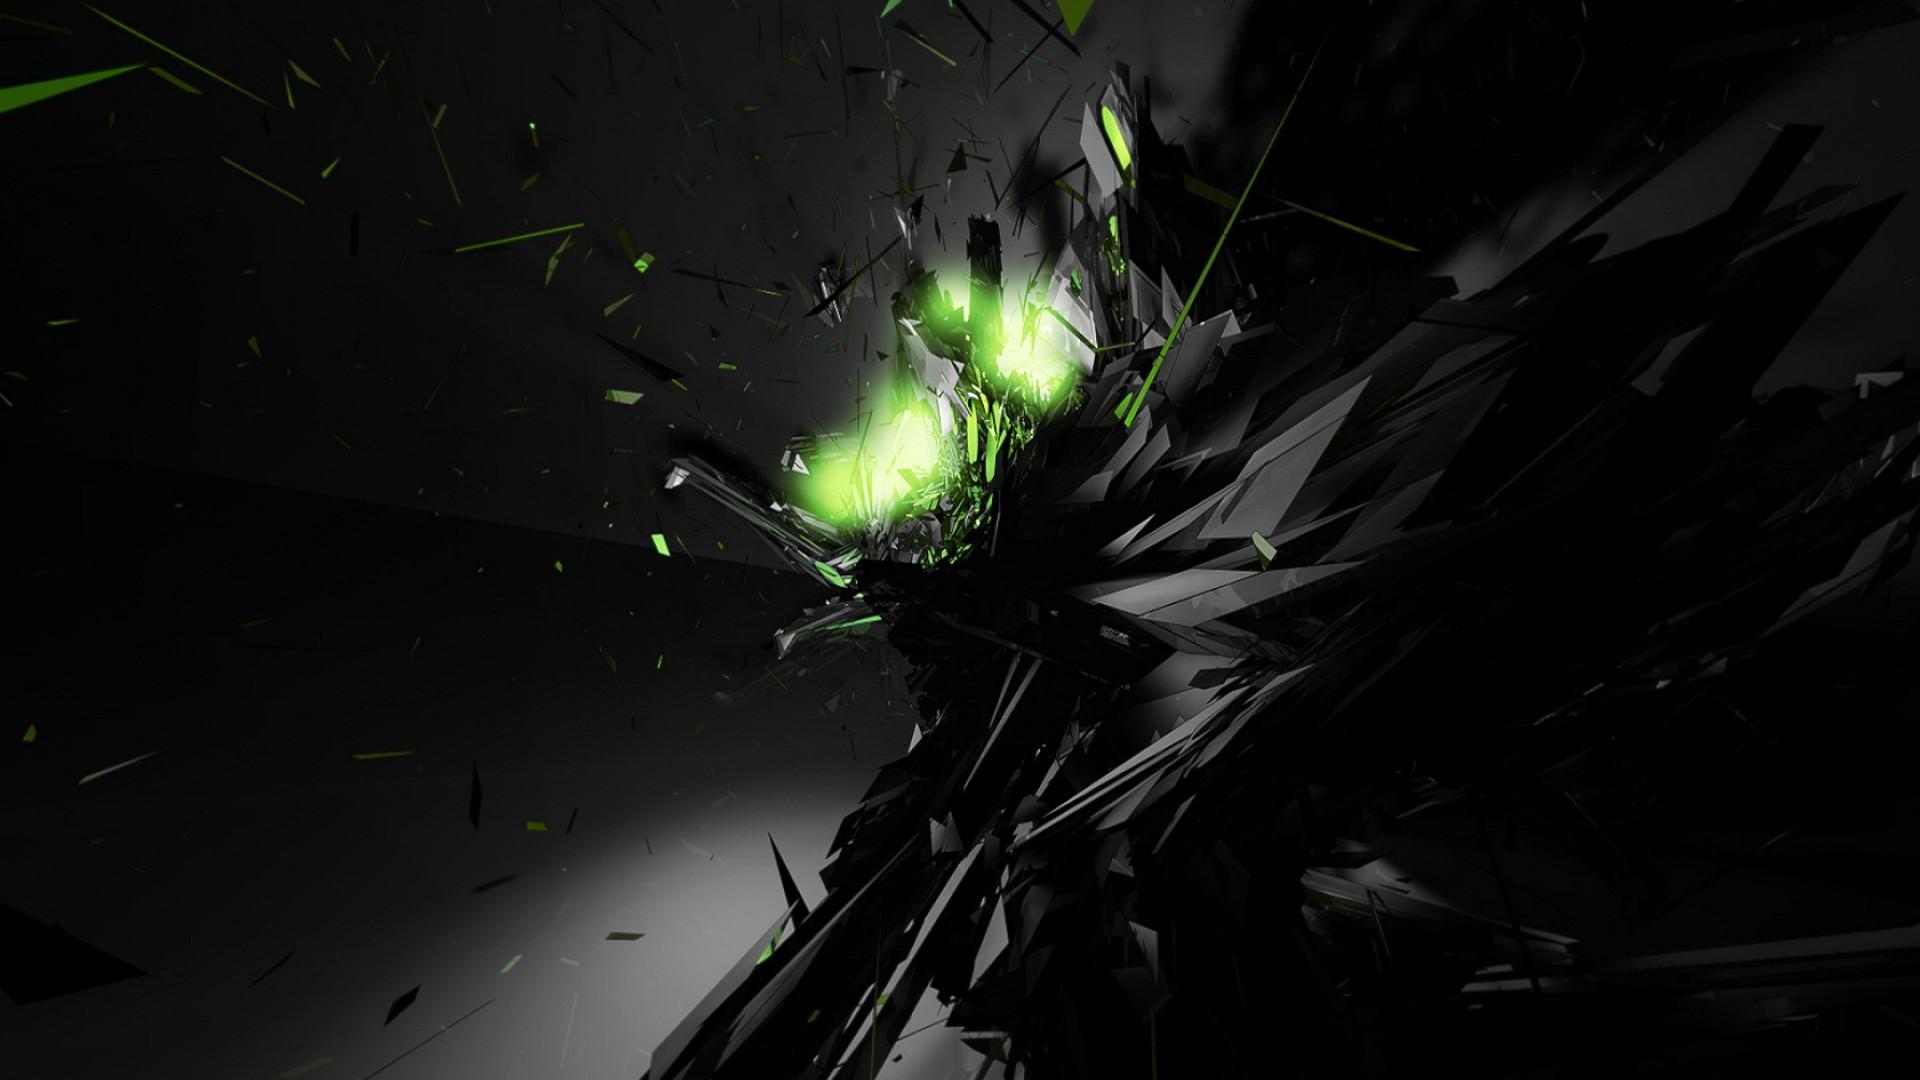 Black Abstract Green Glow Desktop Wallpaper High Quality Wallpapers 1920x1080